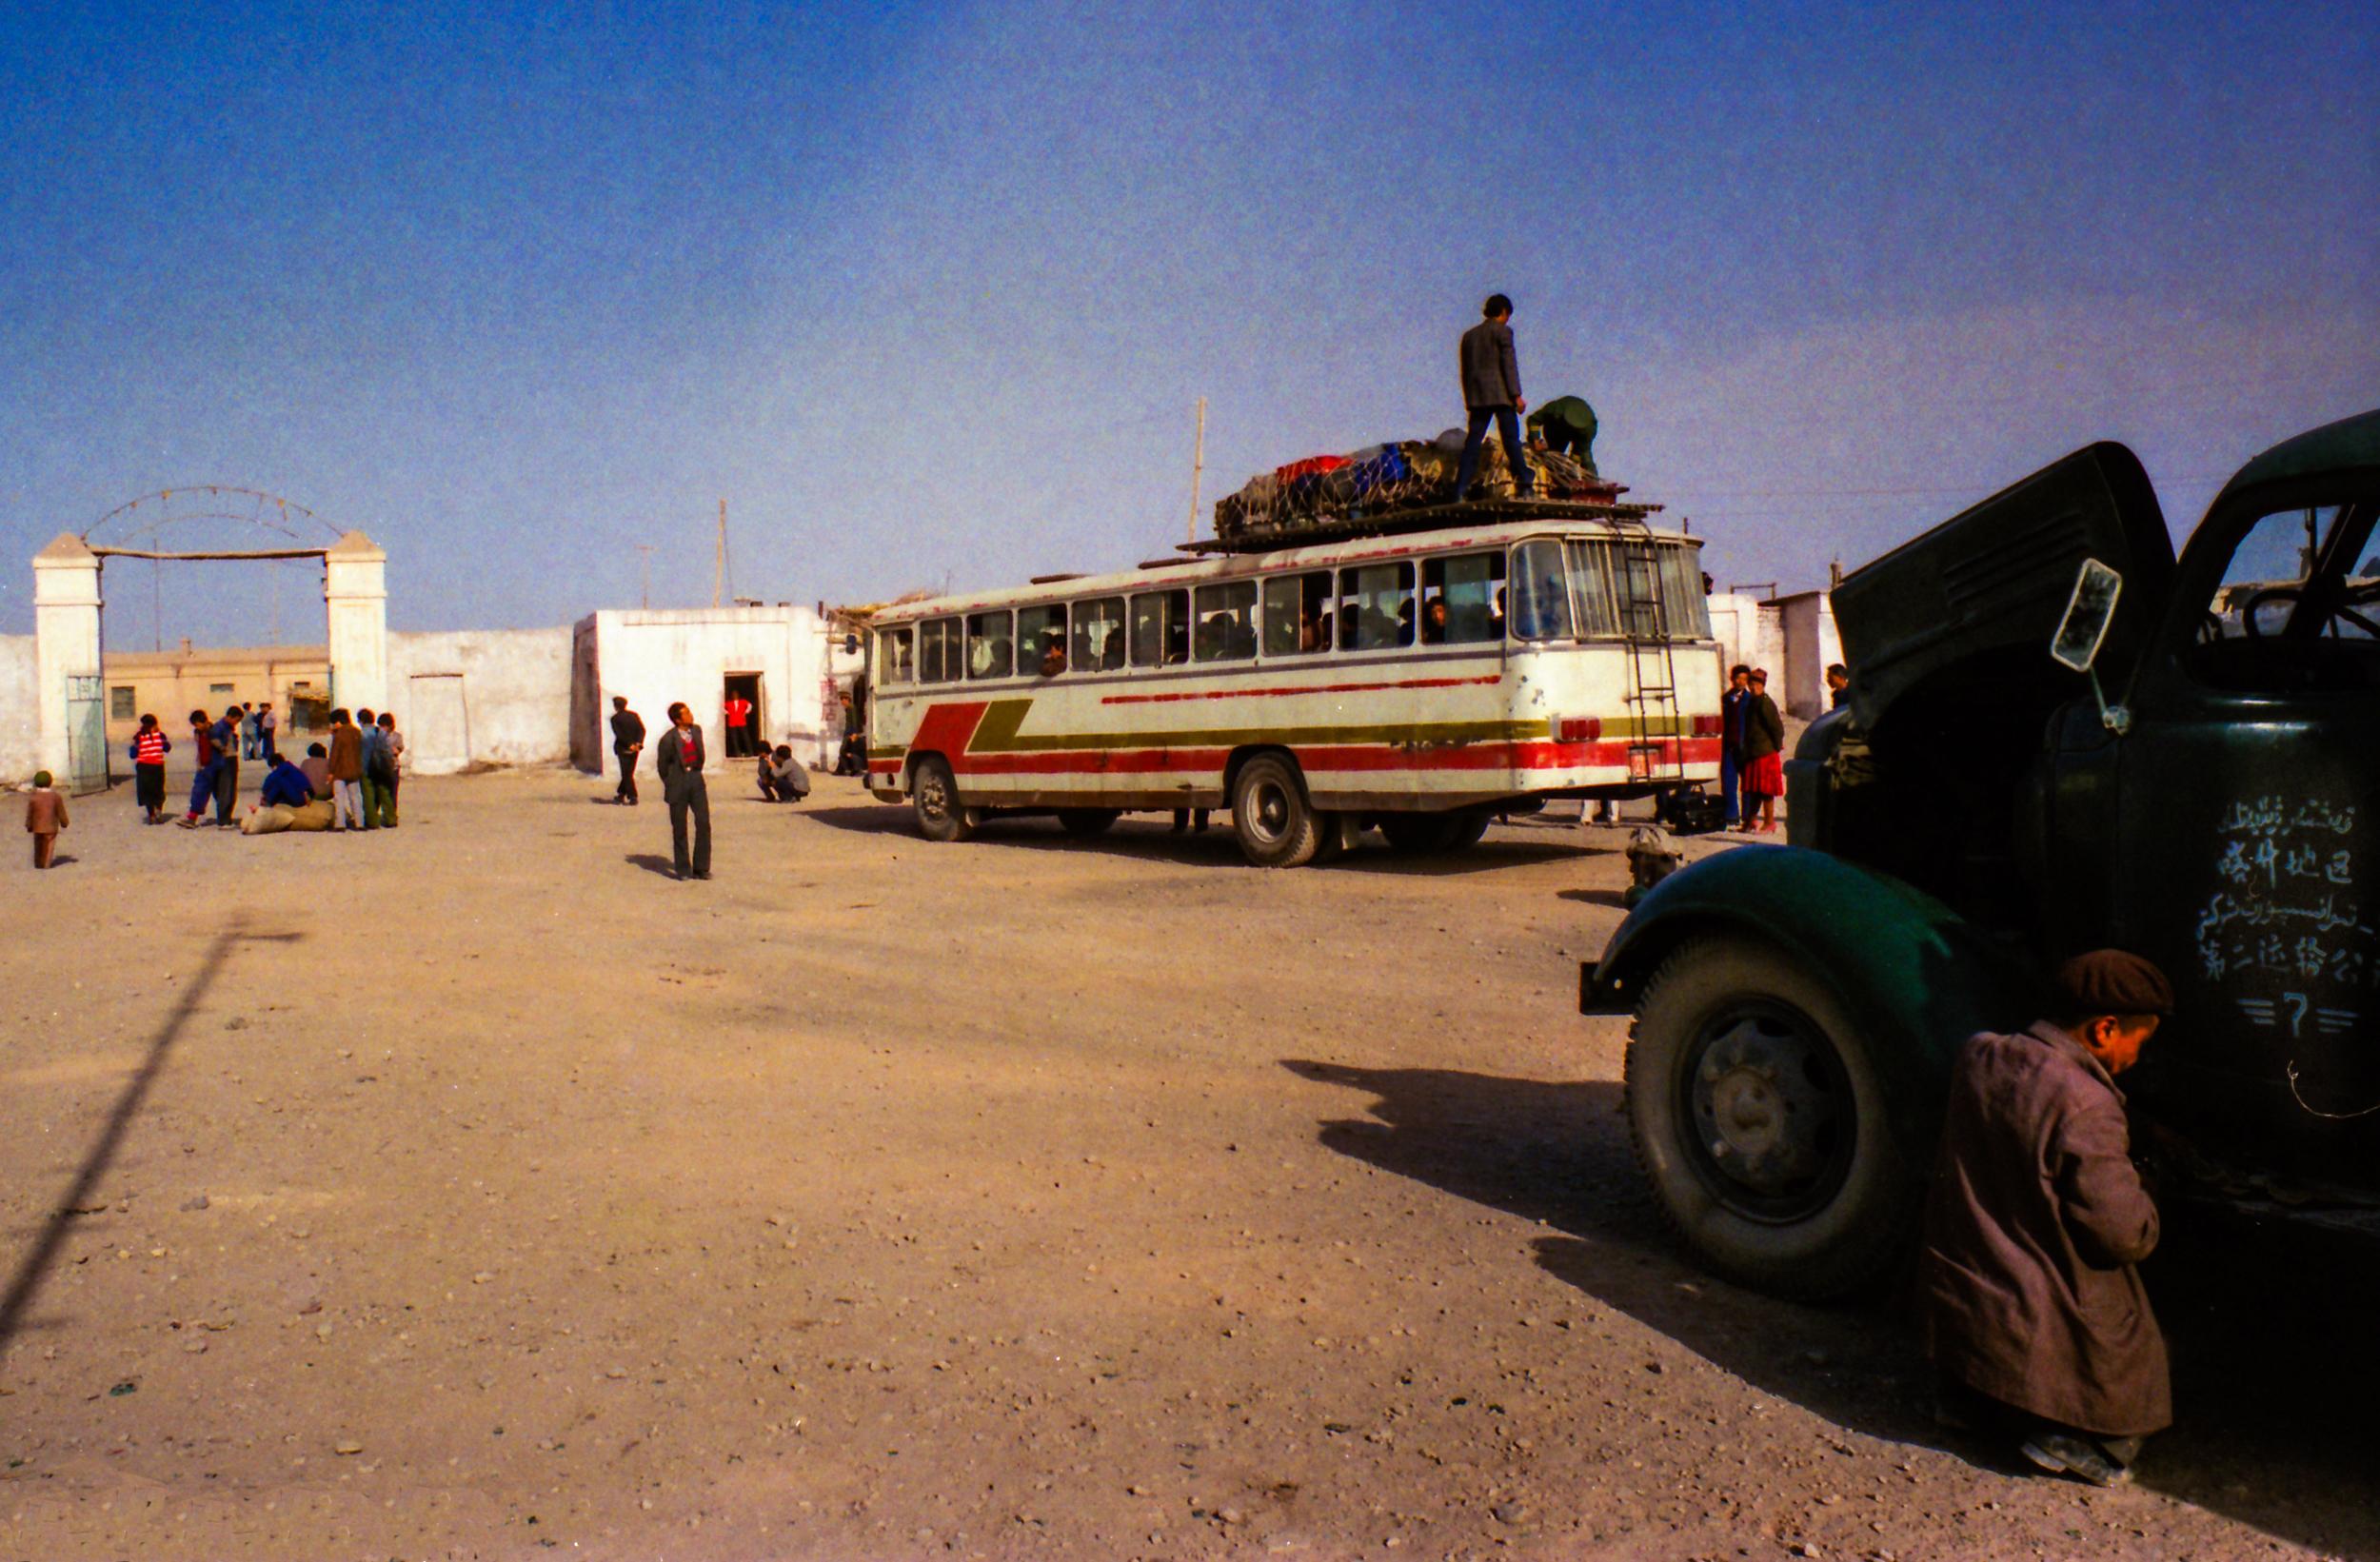 Truckstop on the road between Kashgar and Turfan